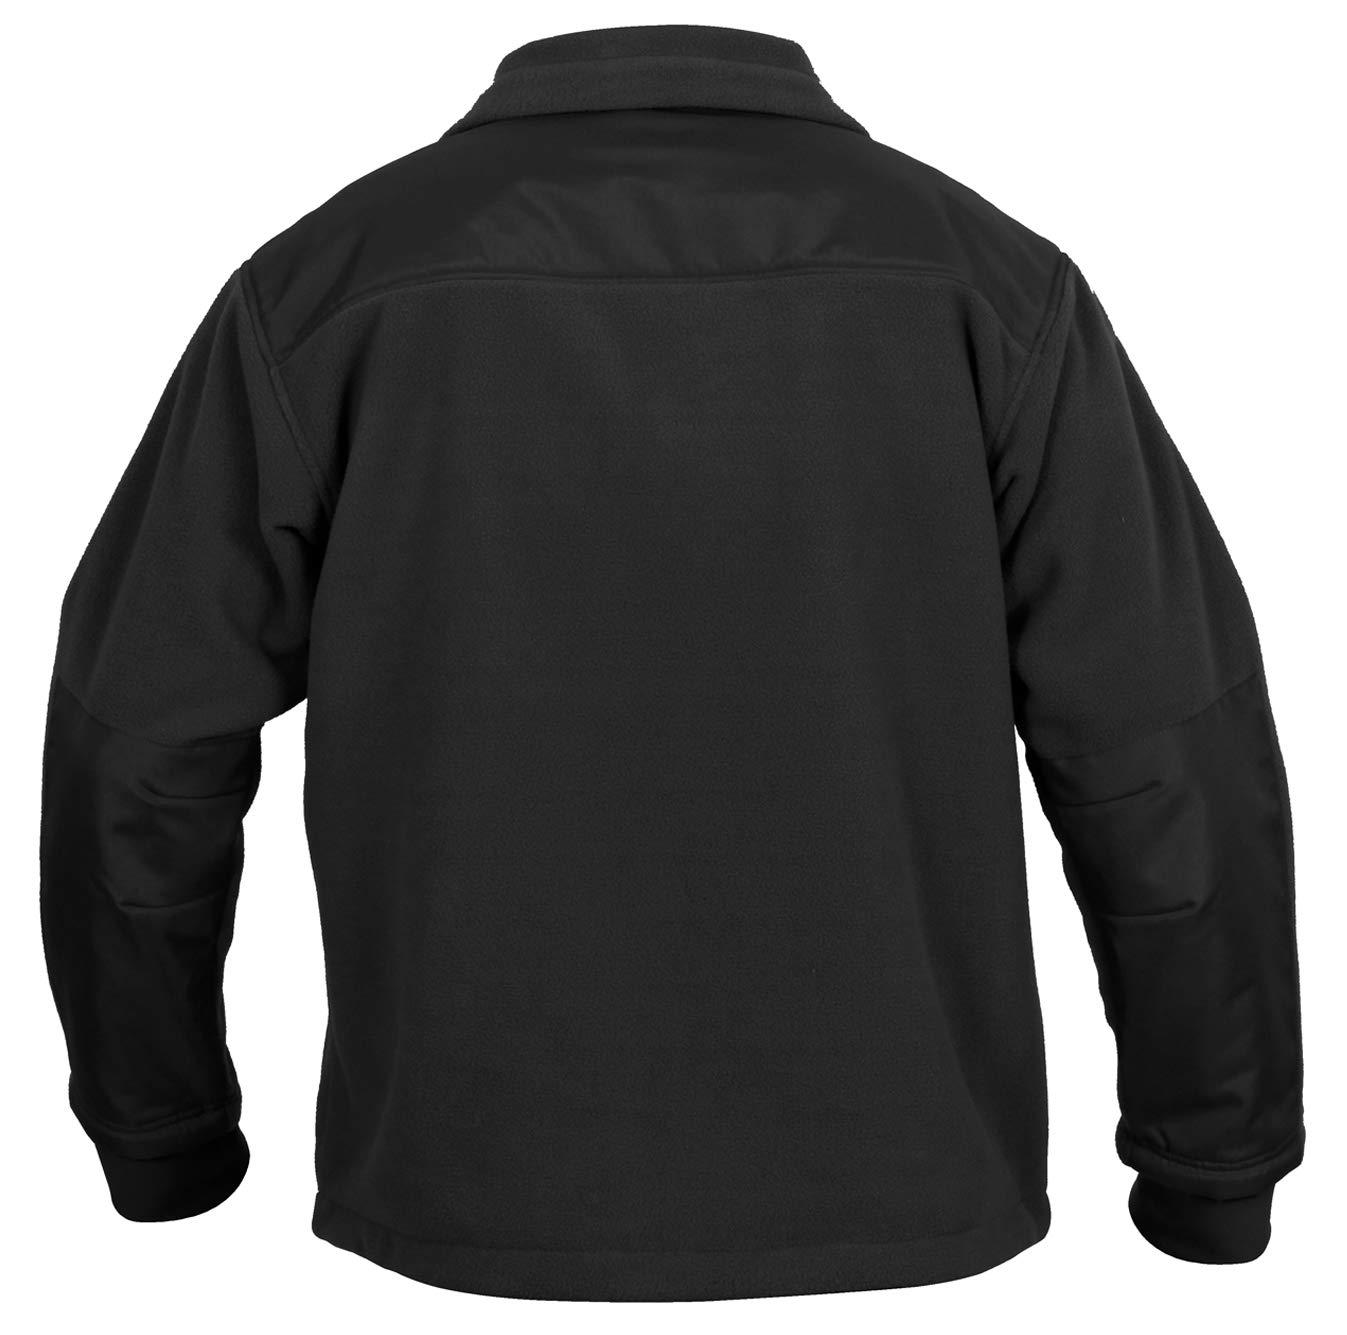 Rothco Spec Ops Tactical Fleece Jacket